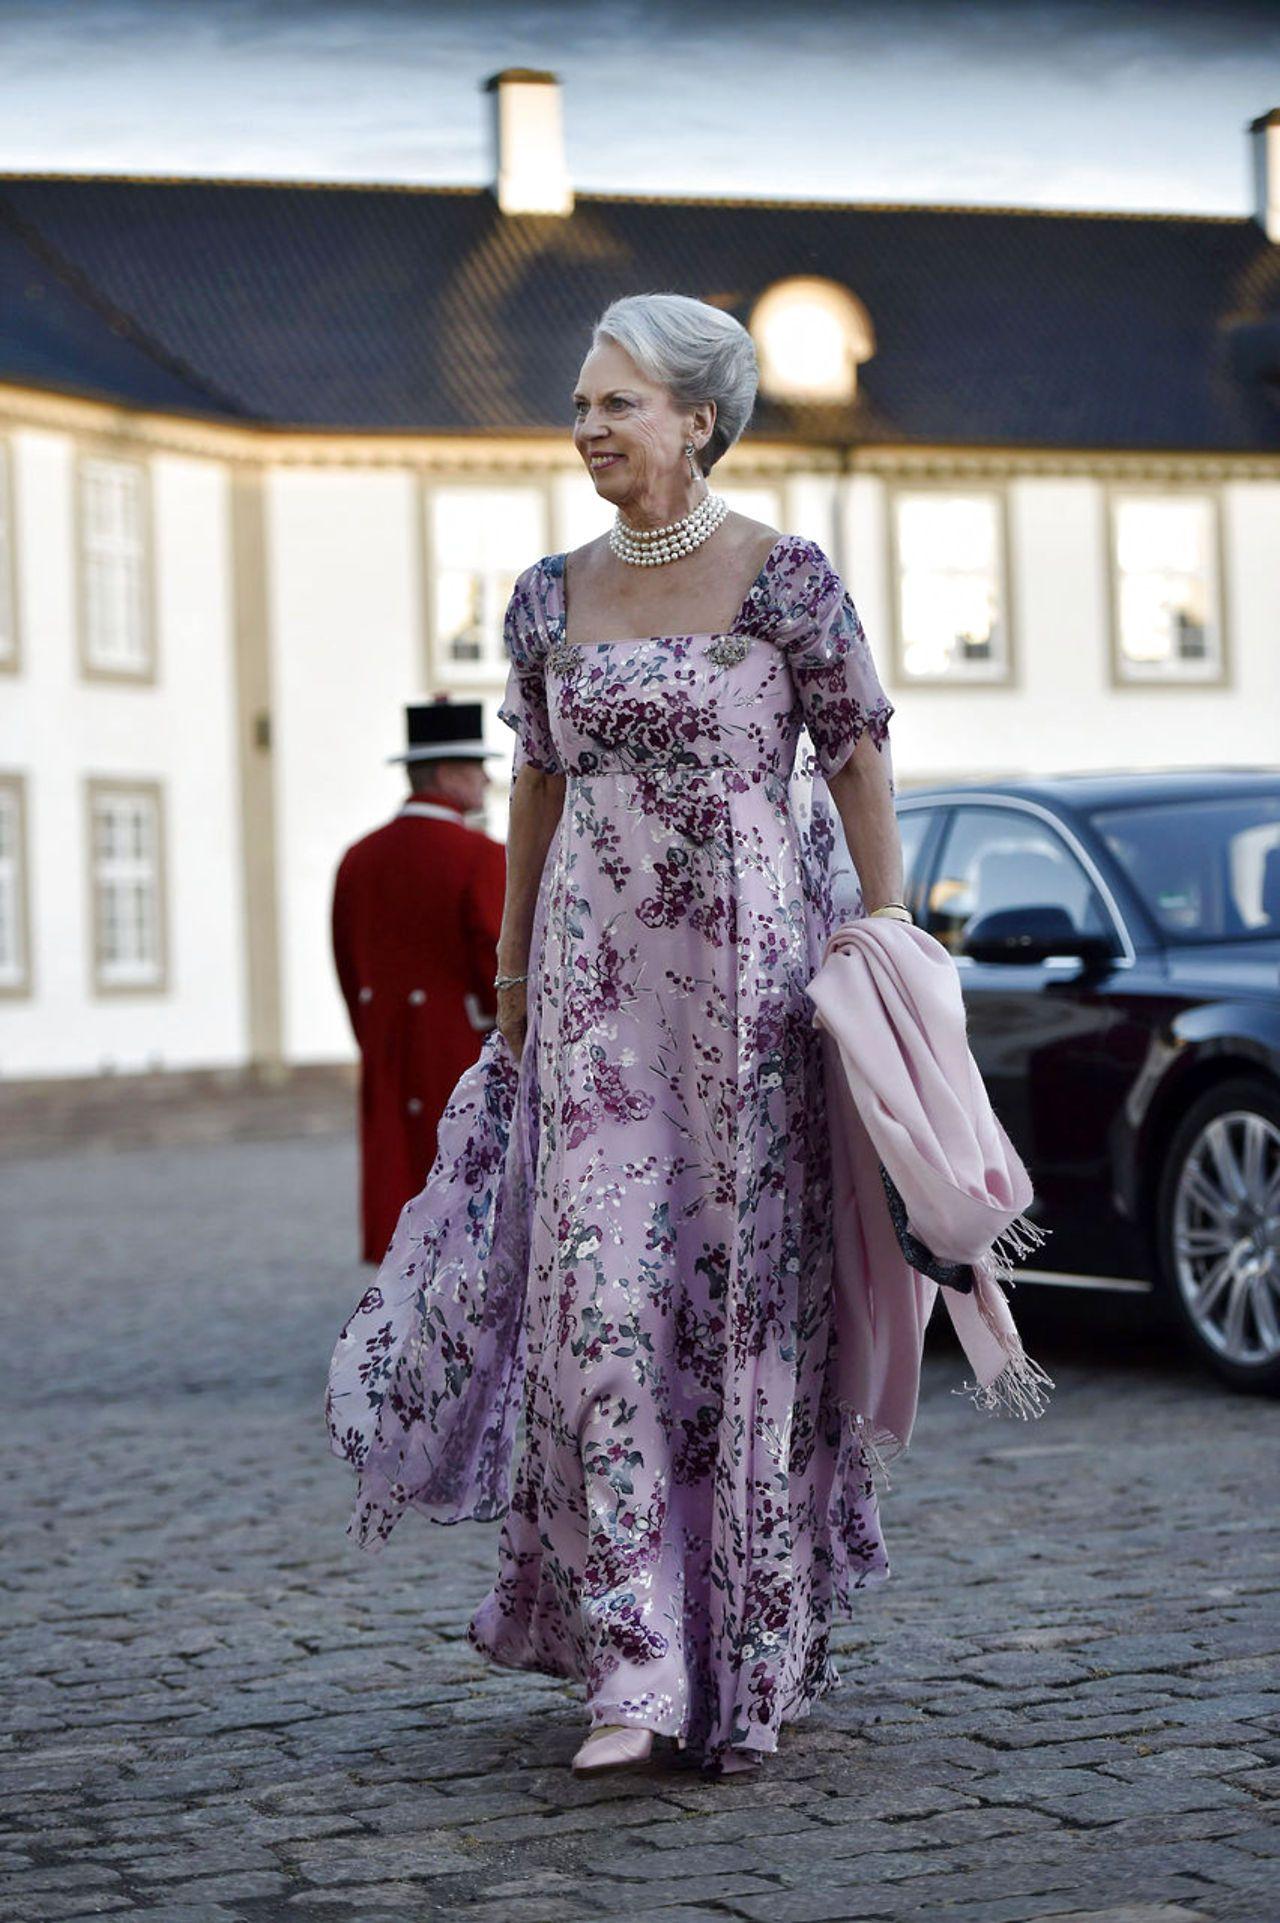 4b650070245 Dronningen fylder 75 - se billederne fra hele dagen   www.b.dk ...